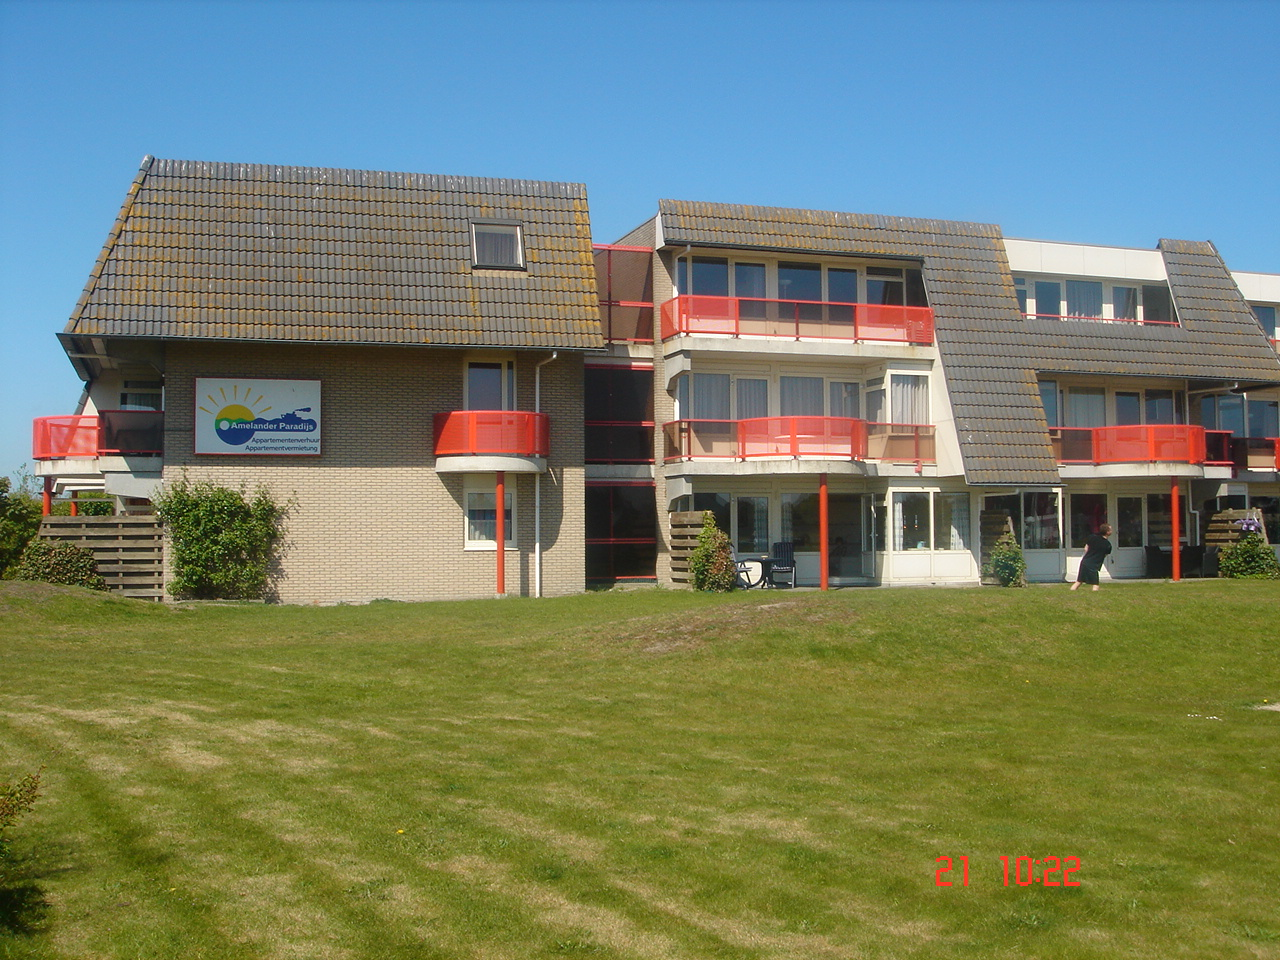 Apartments-BuitendeDuinen-11-25.JPG